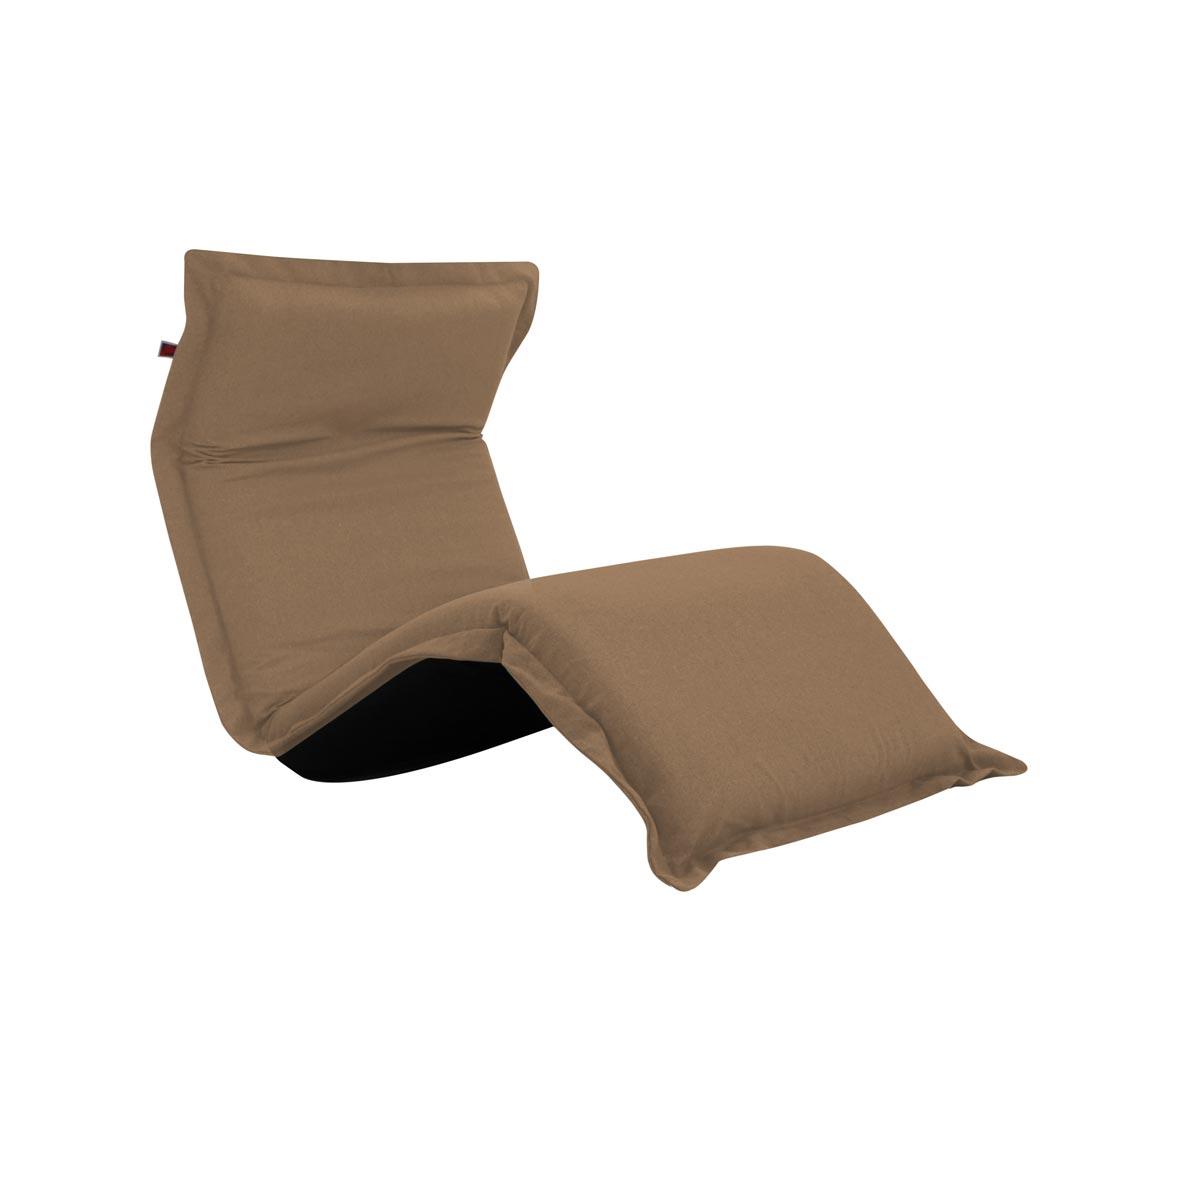 Pufe ClicClac Uno Lounge Tecido Ecolona Kraft 02 06